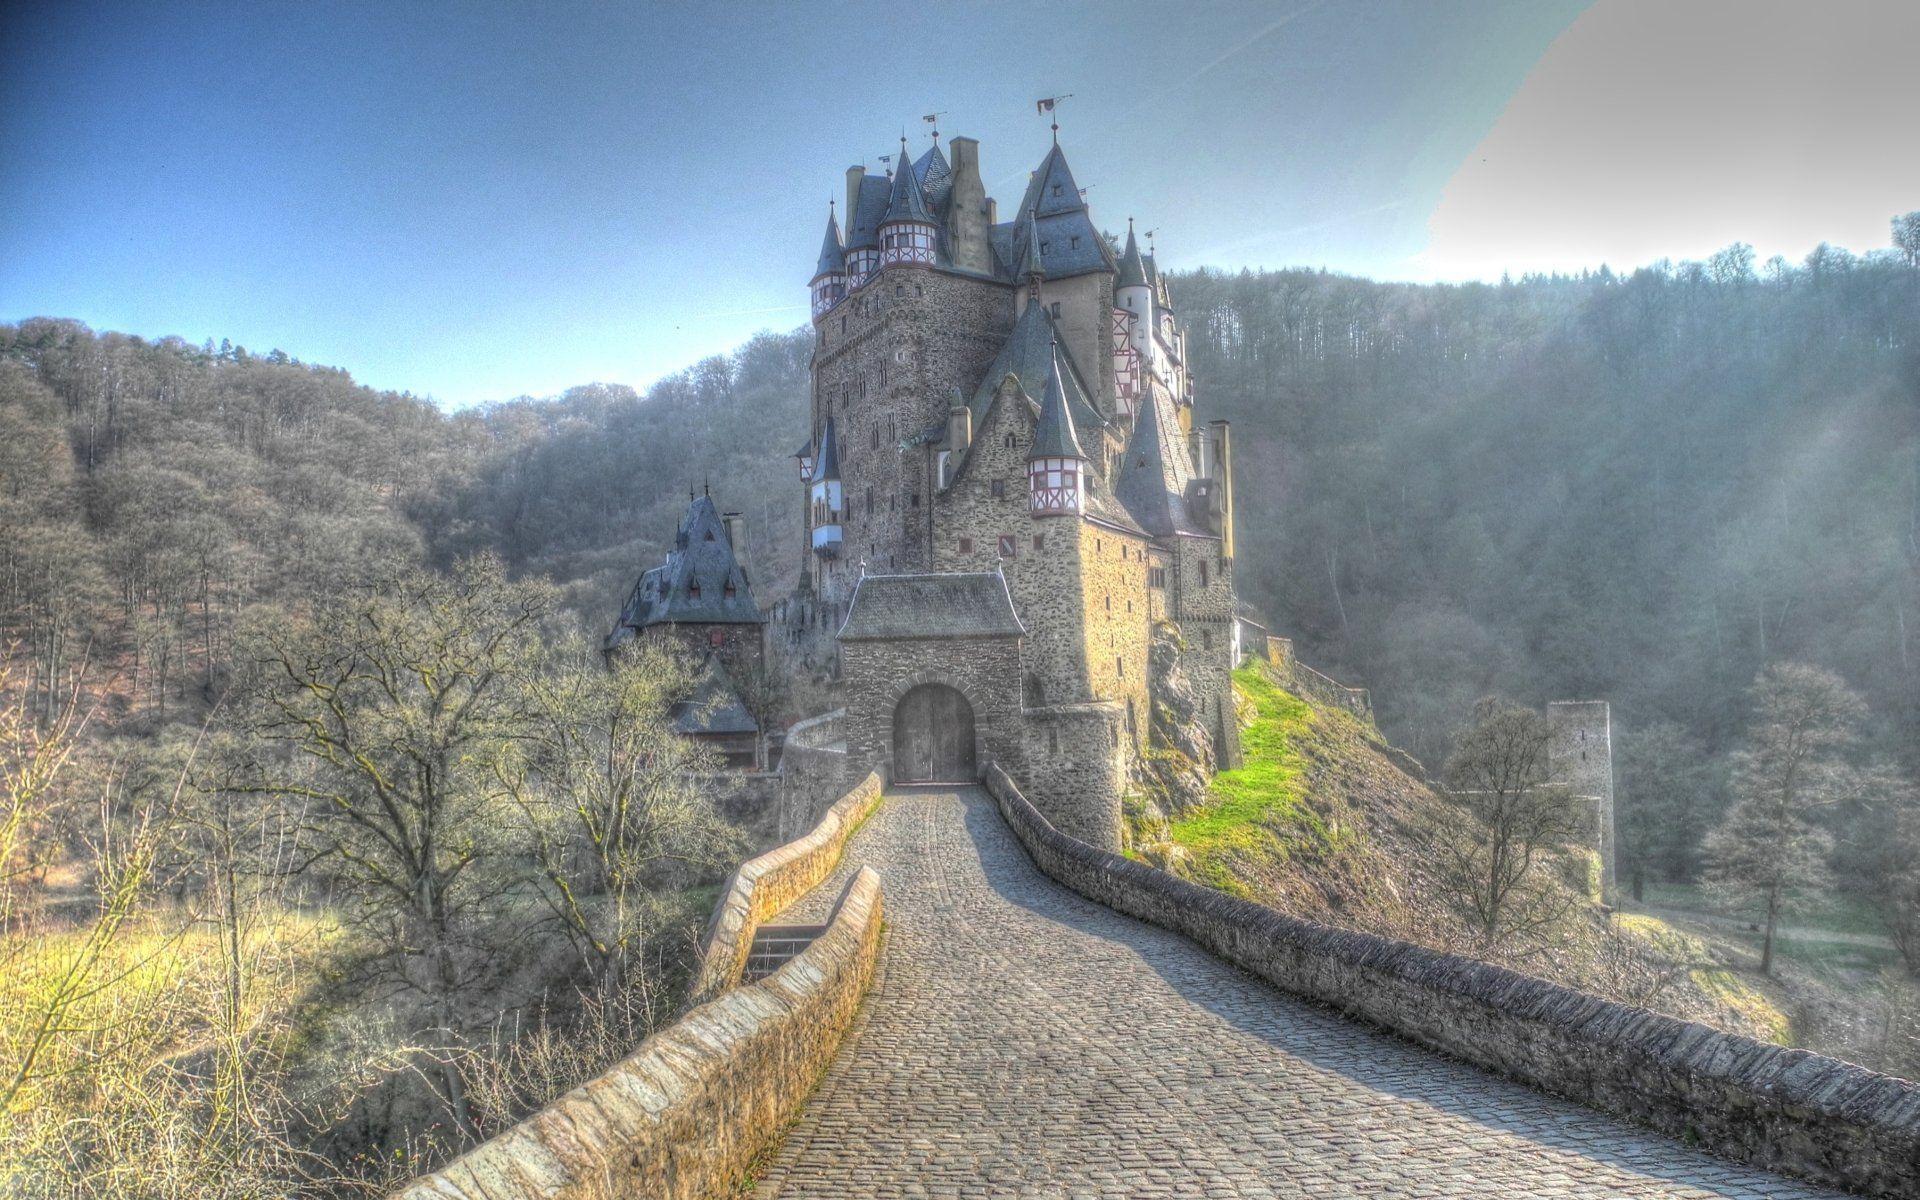 Castle Wallpapers Top Free Castle Backgrounds